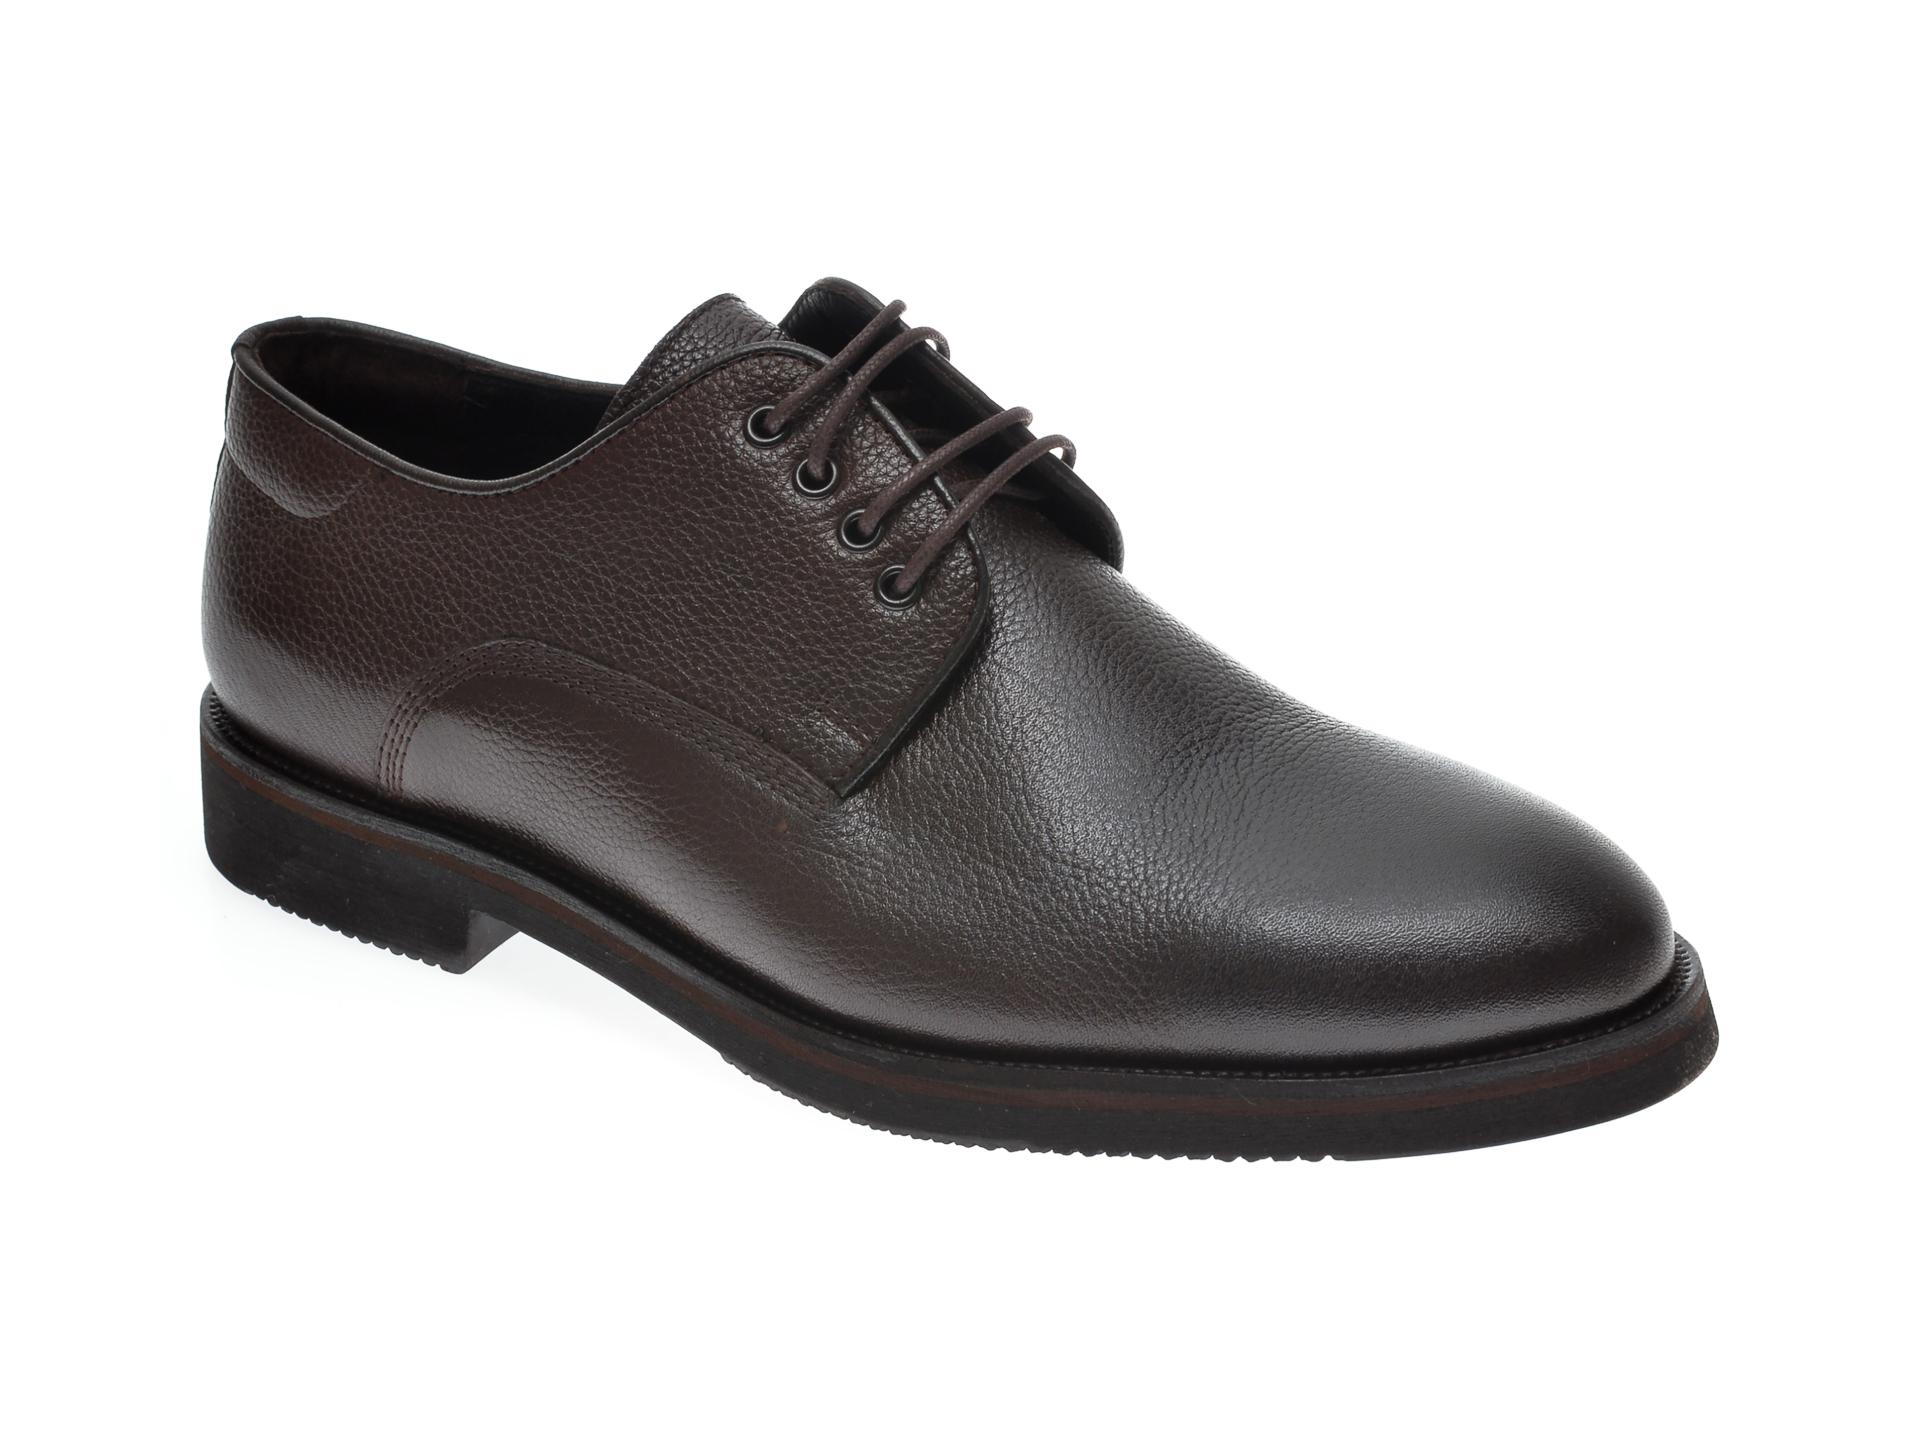 Pantofi OTTER maro, 20KL701, din piele naturala imagine